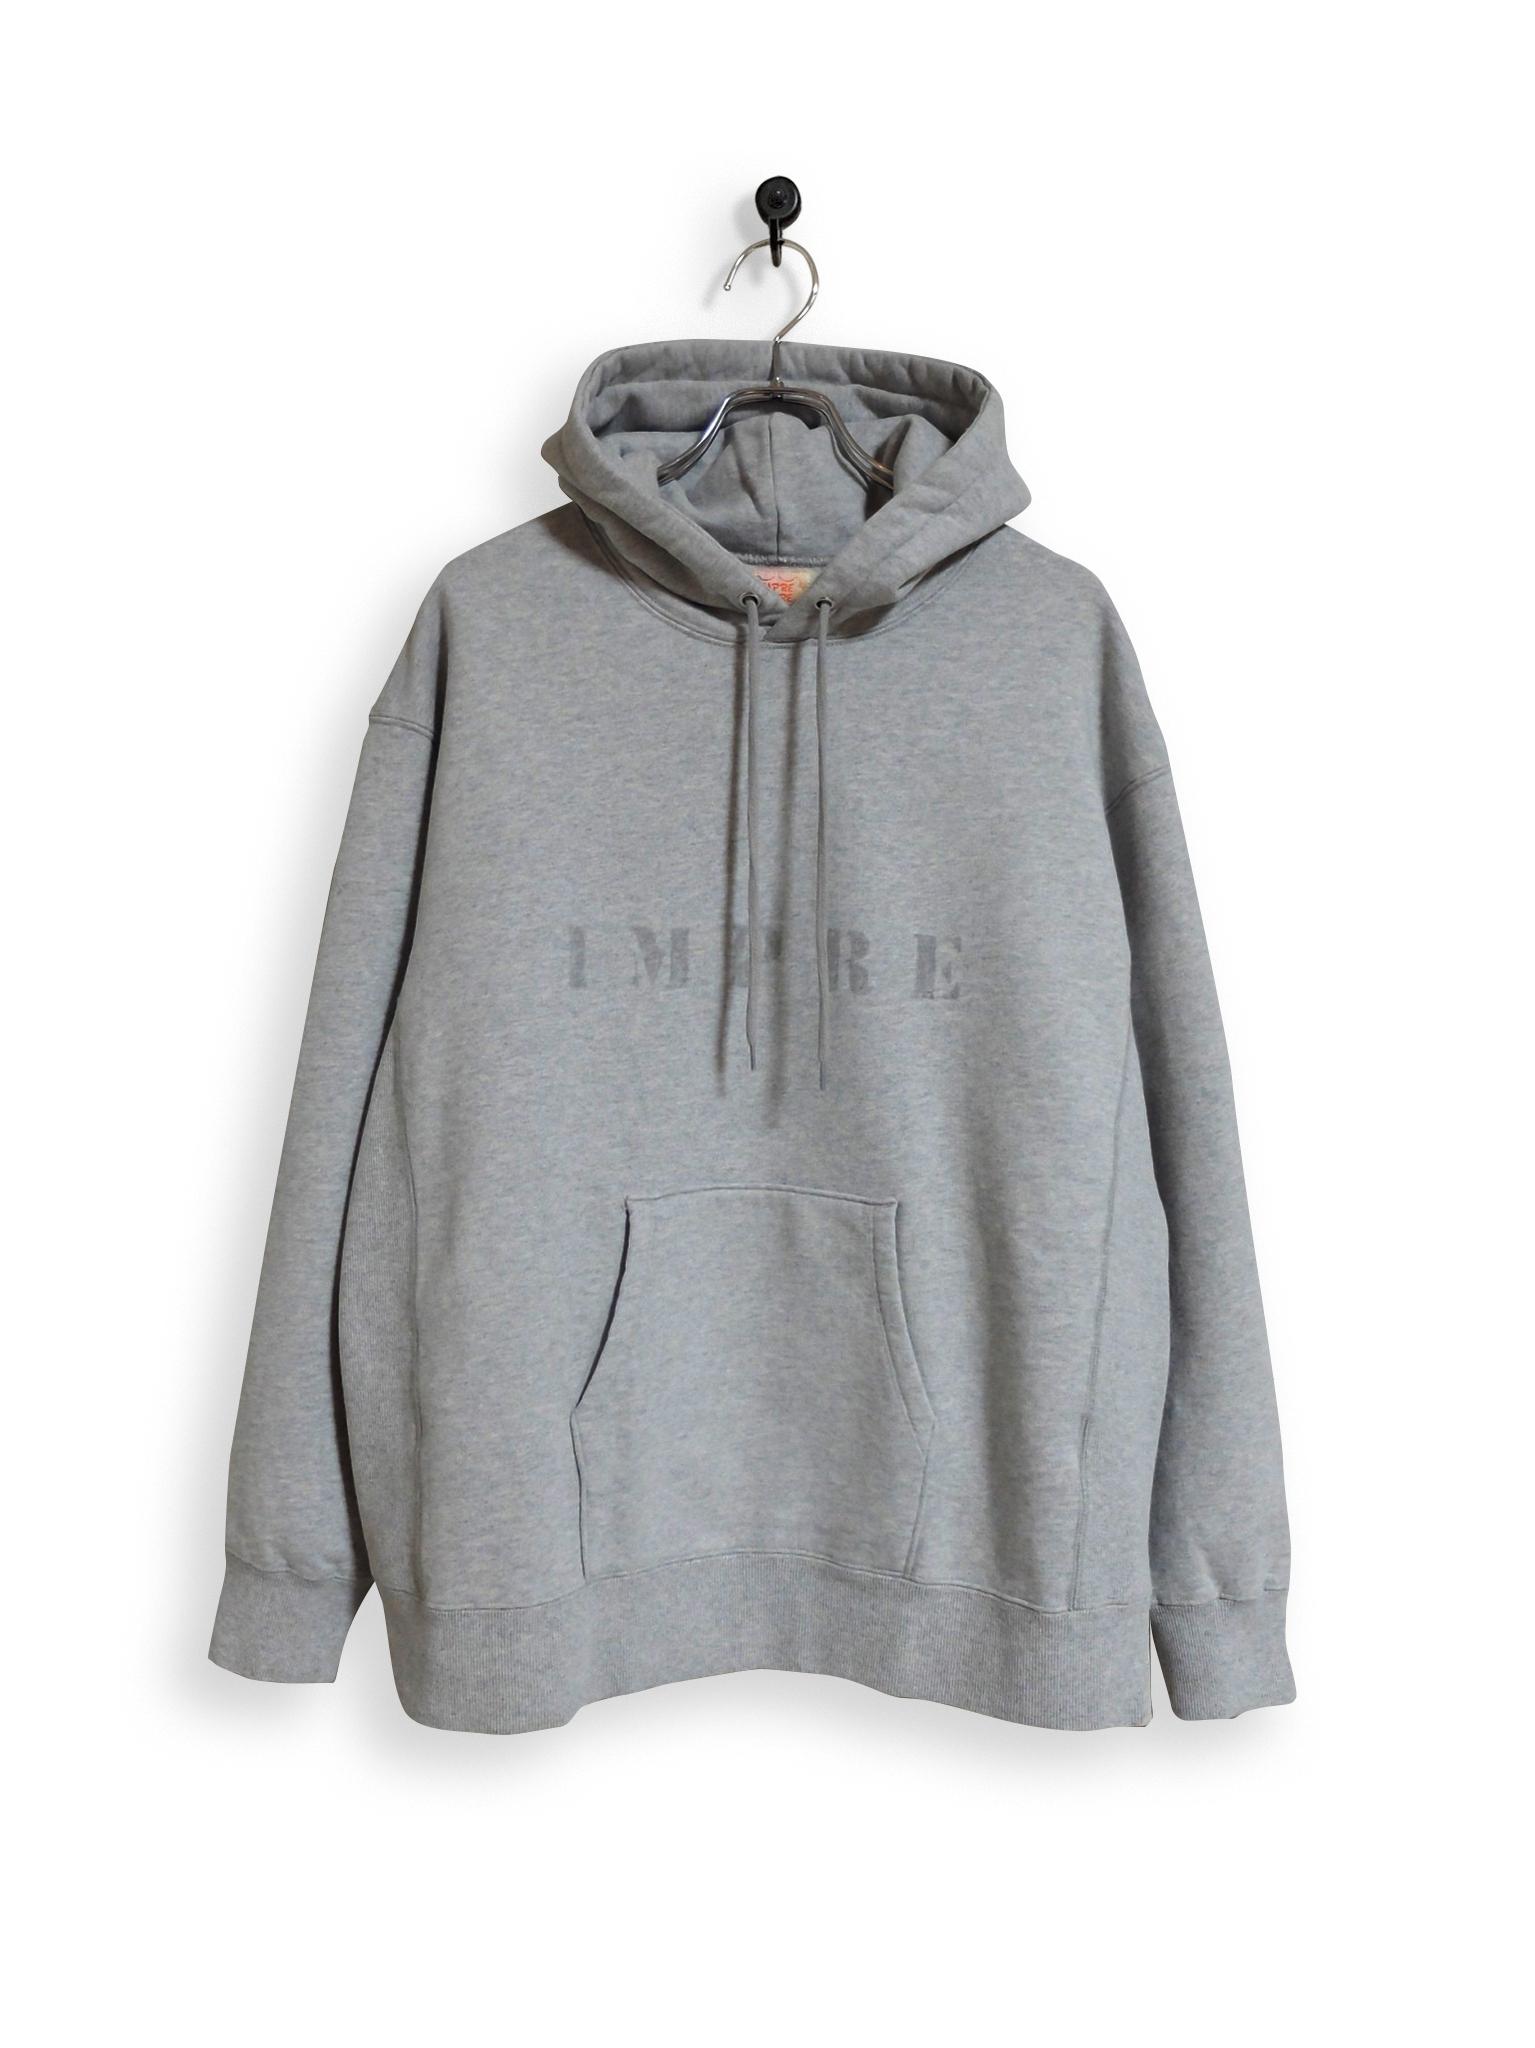 Original Hooded Sweatshirt / stencil / gray